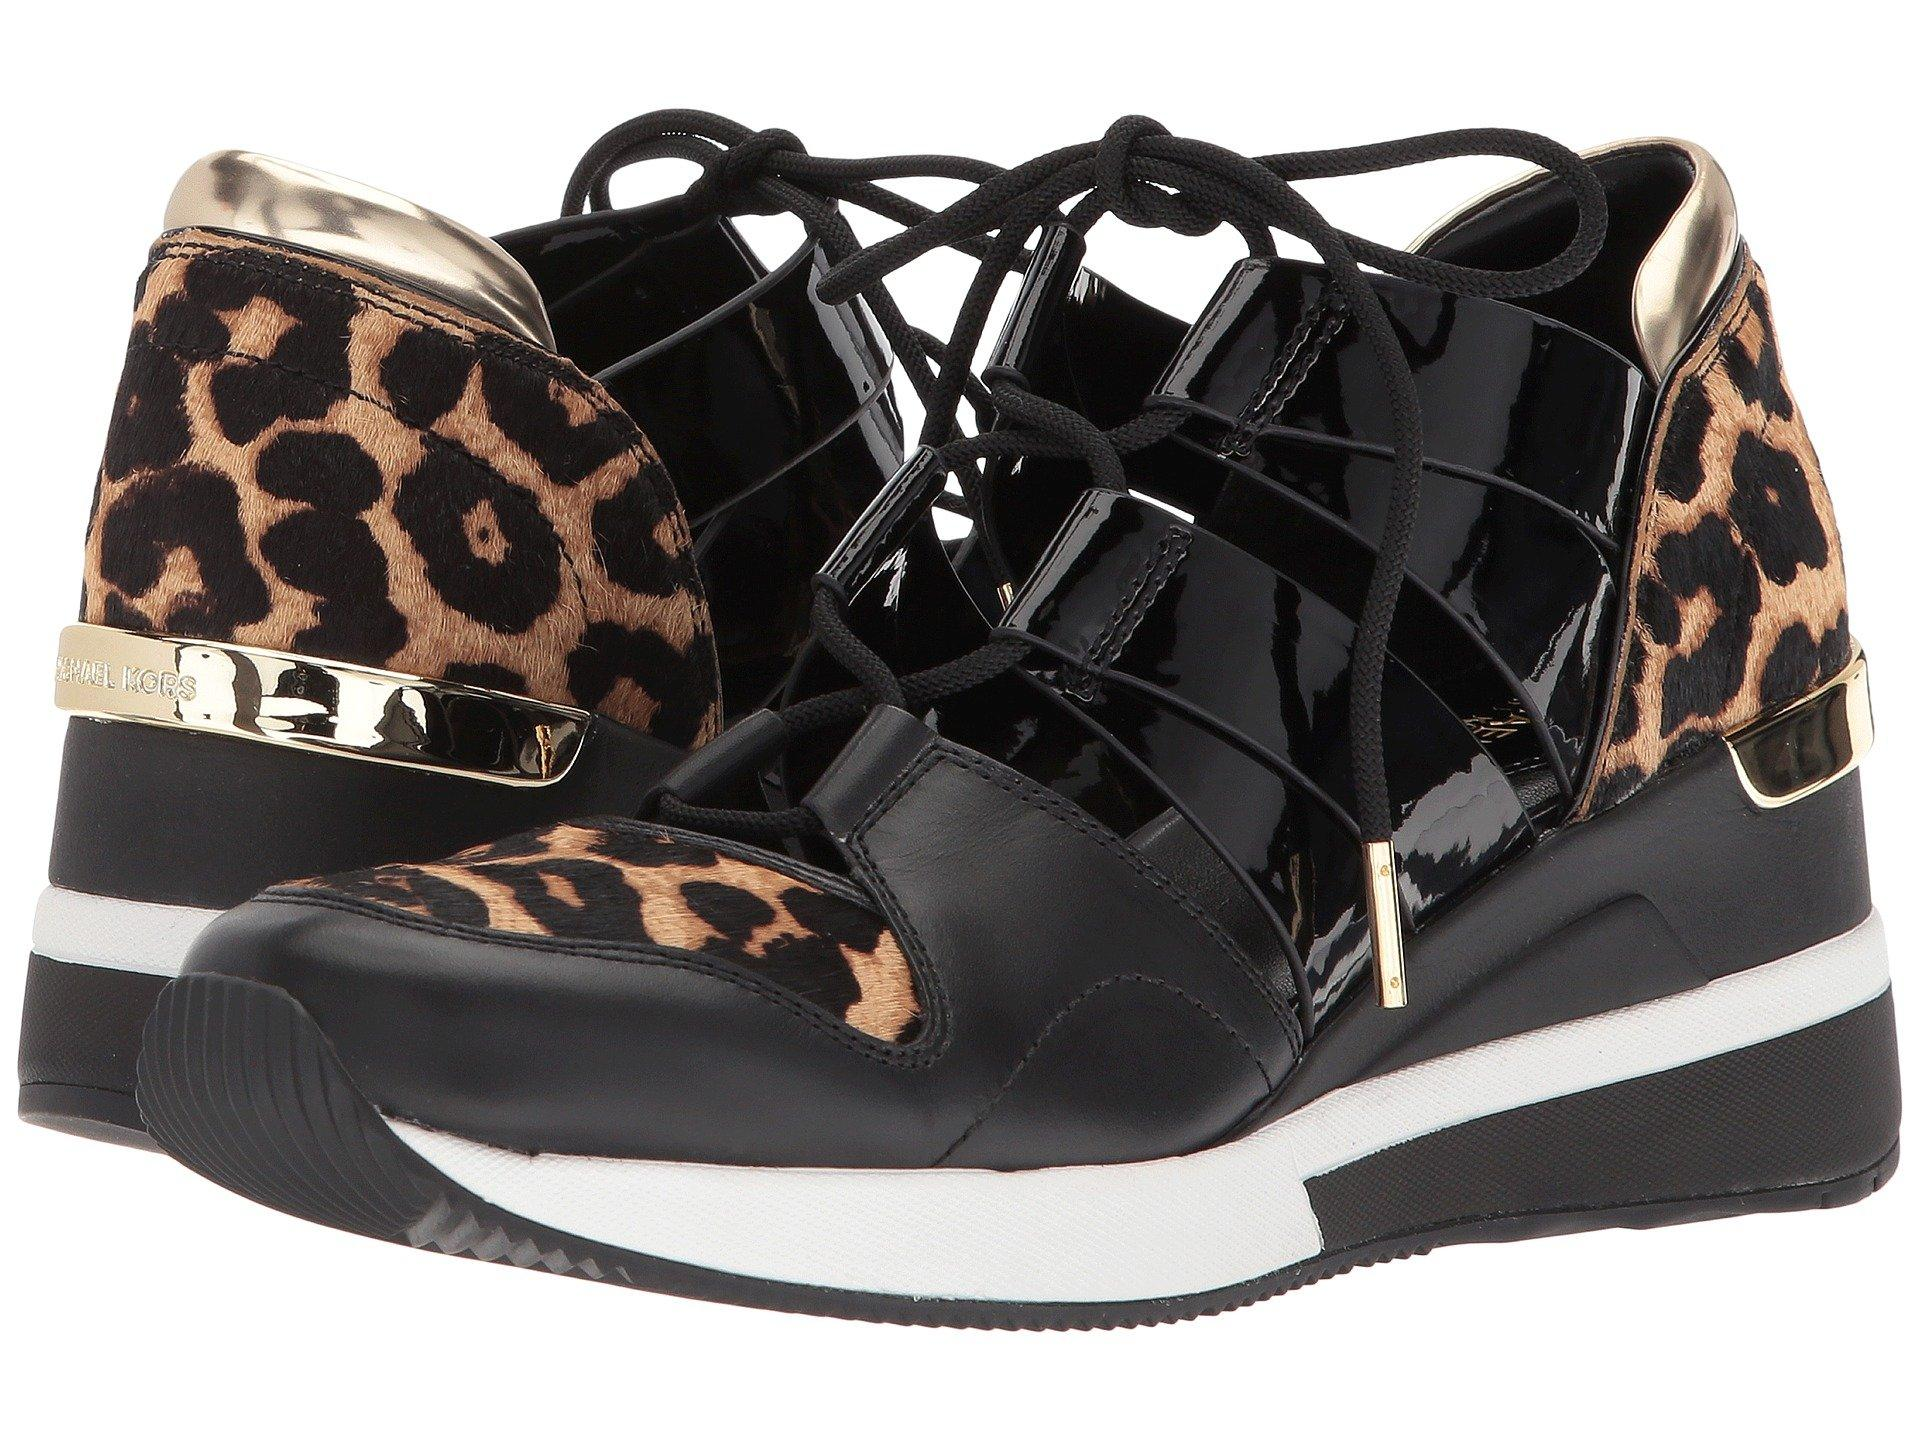 0c277c74d58e Michael Michael Kors Beckett Trainer, Natural/Black Cheetah Haircalf/Patent  Pu/Vachetta